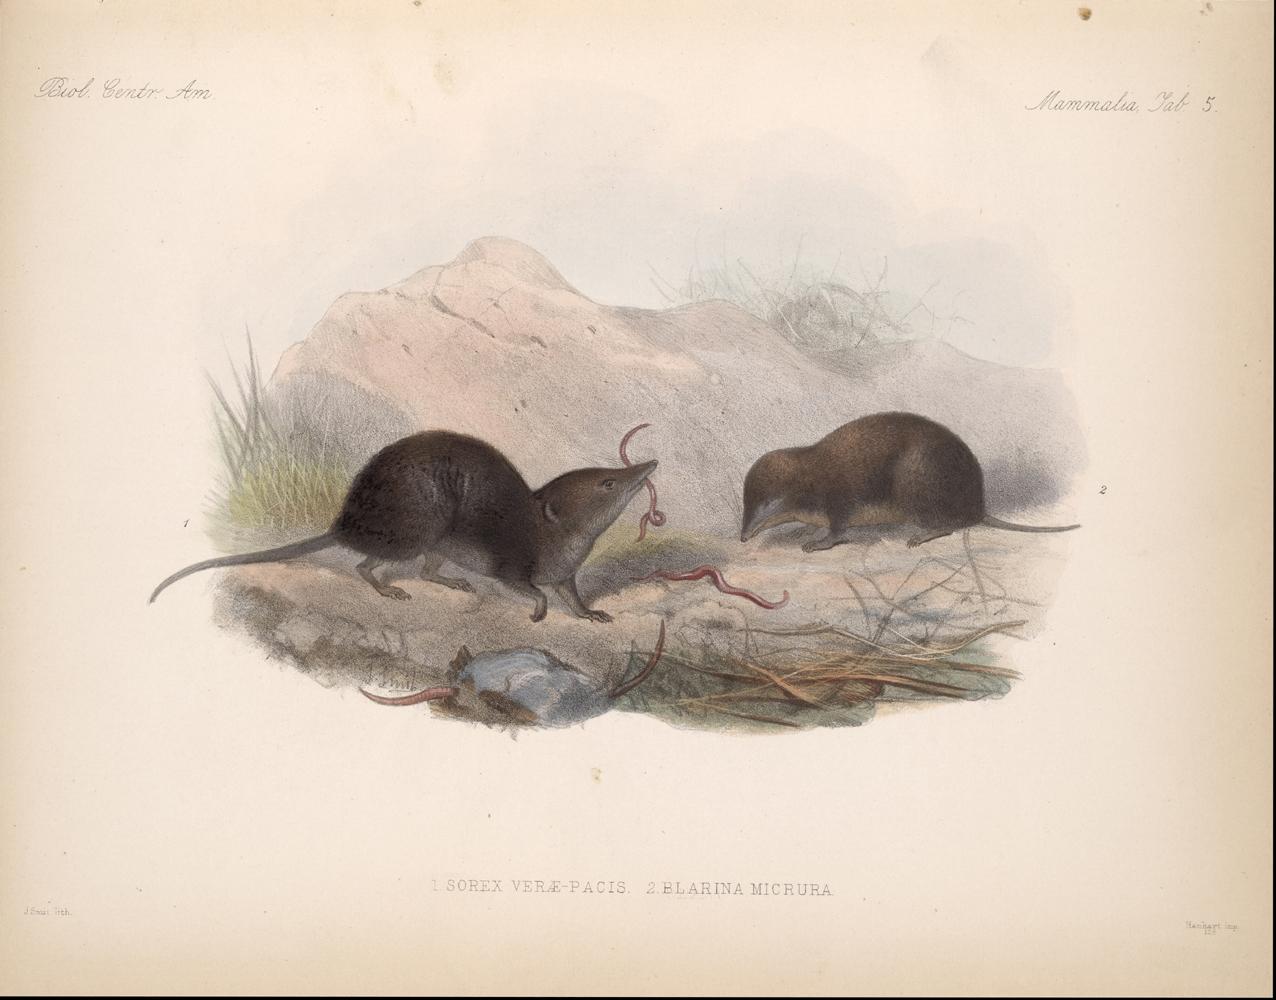 Mammals,  Image number:bca_02_00_00_257